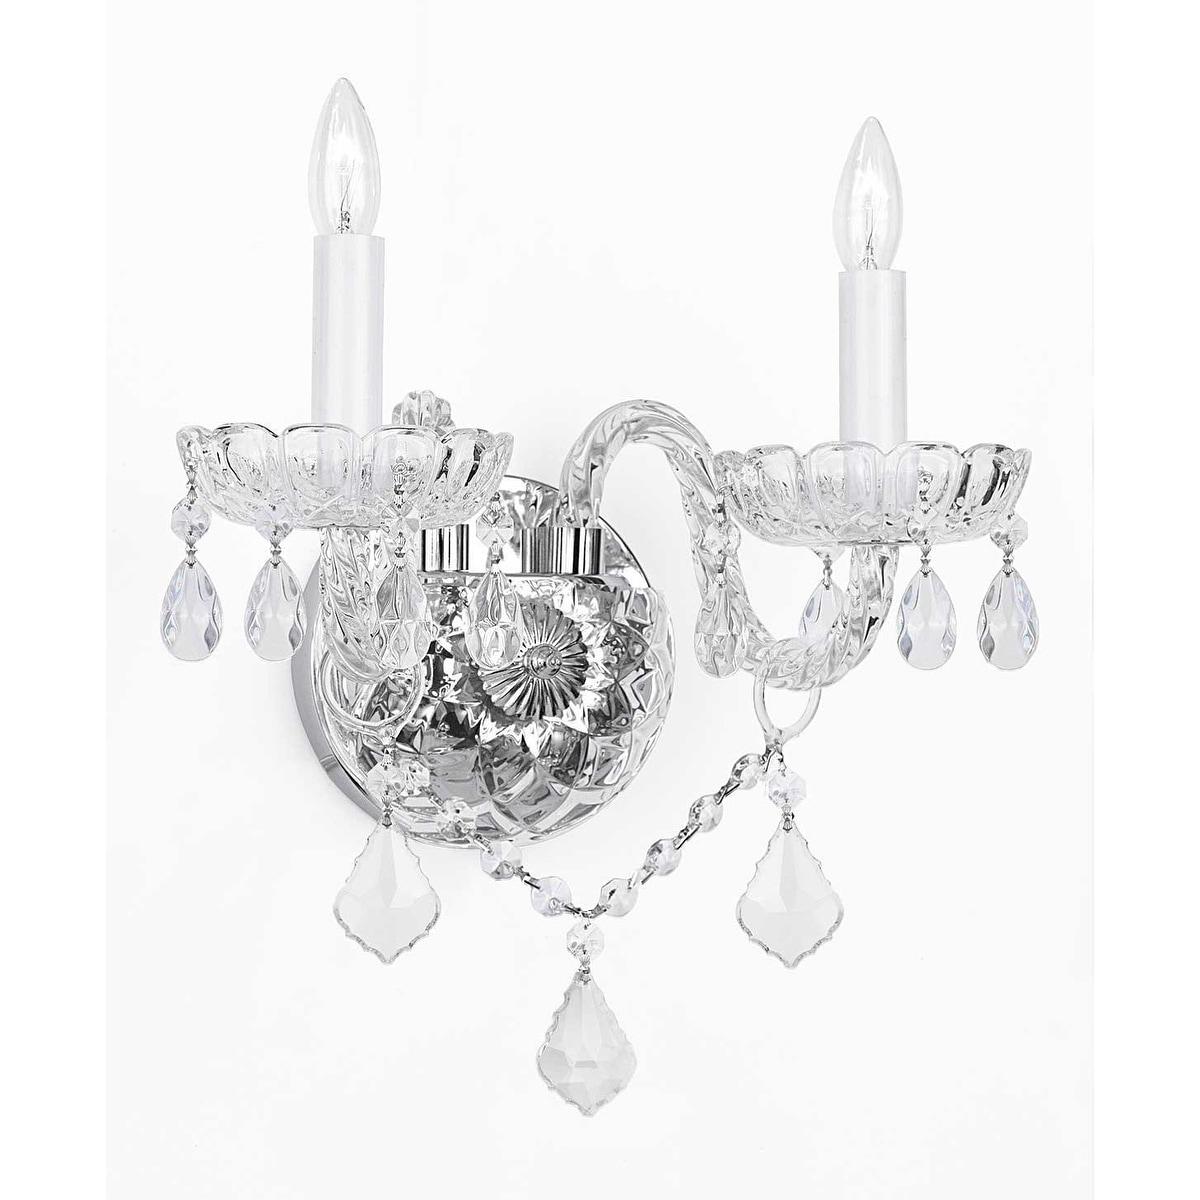 Swarovski Elements Crystal Trimmed Wall Sconce Venetian Style